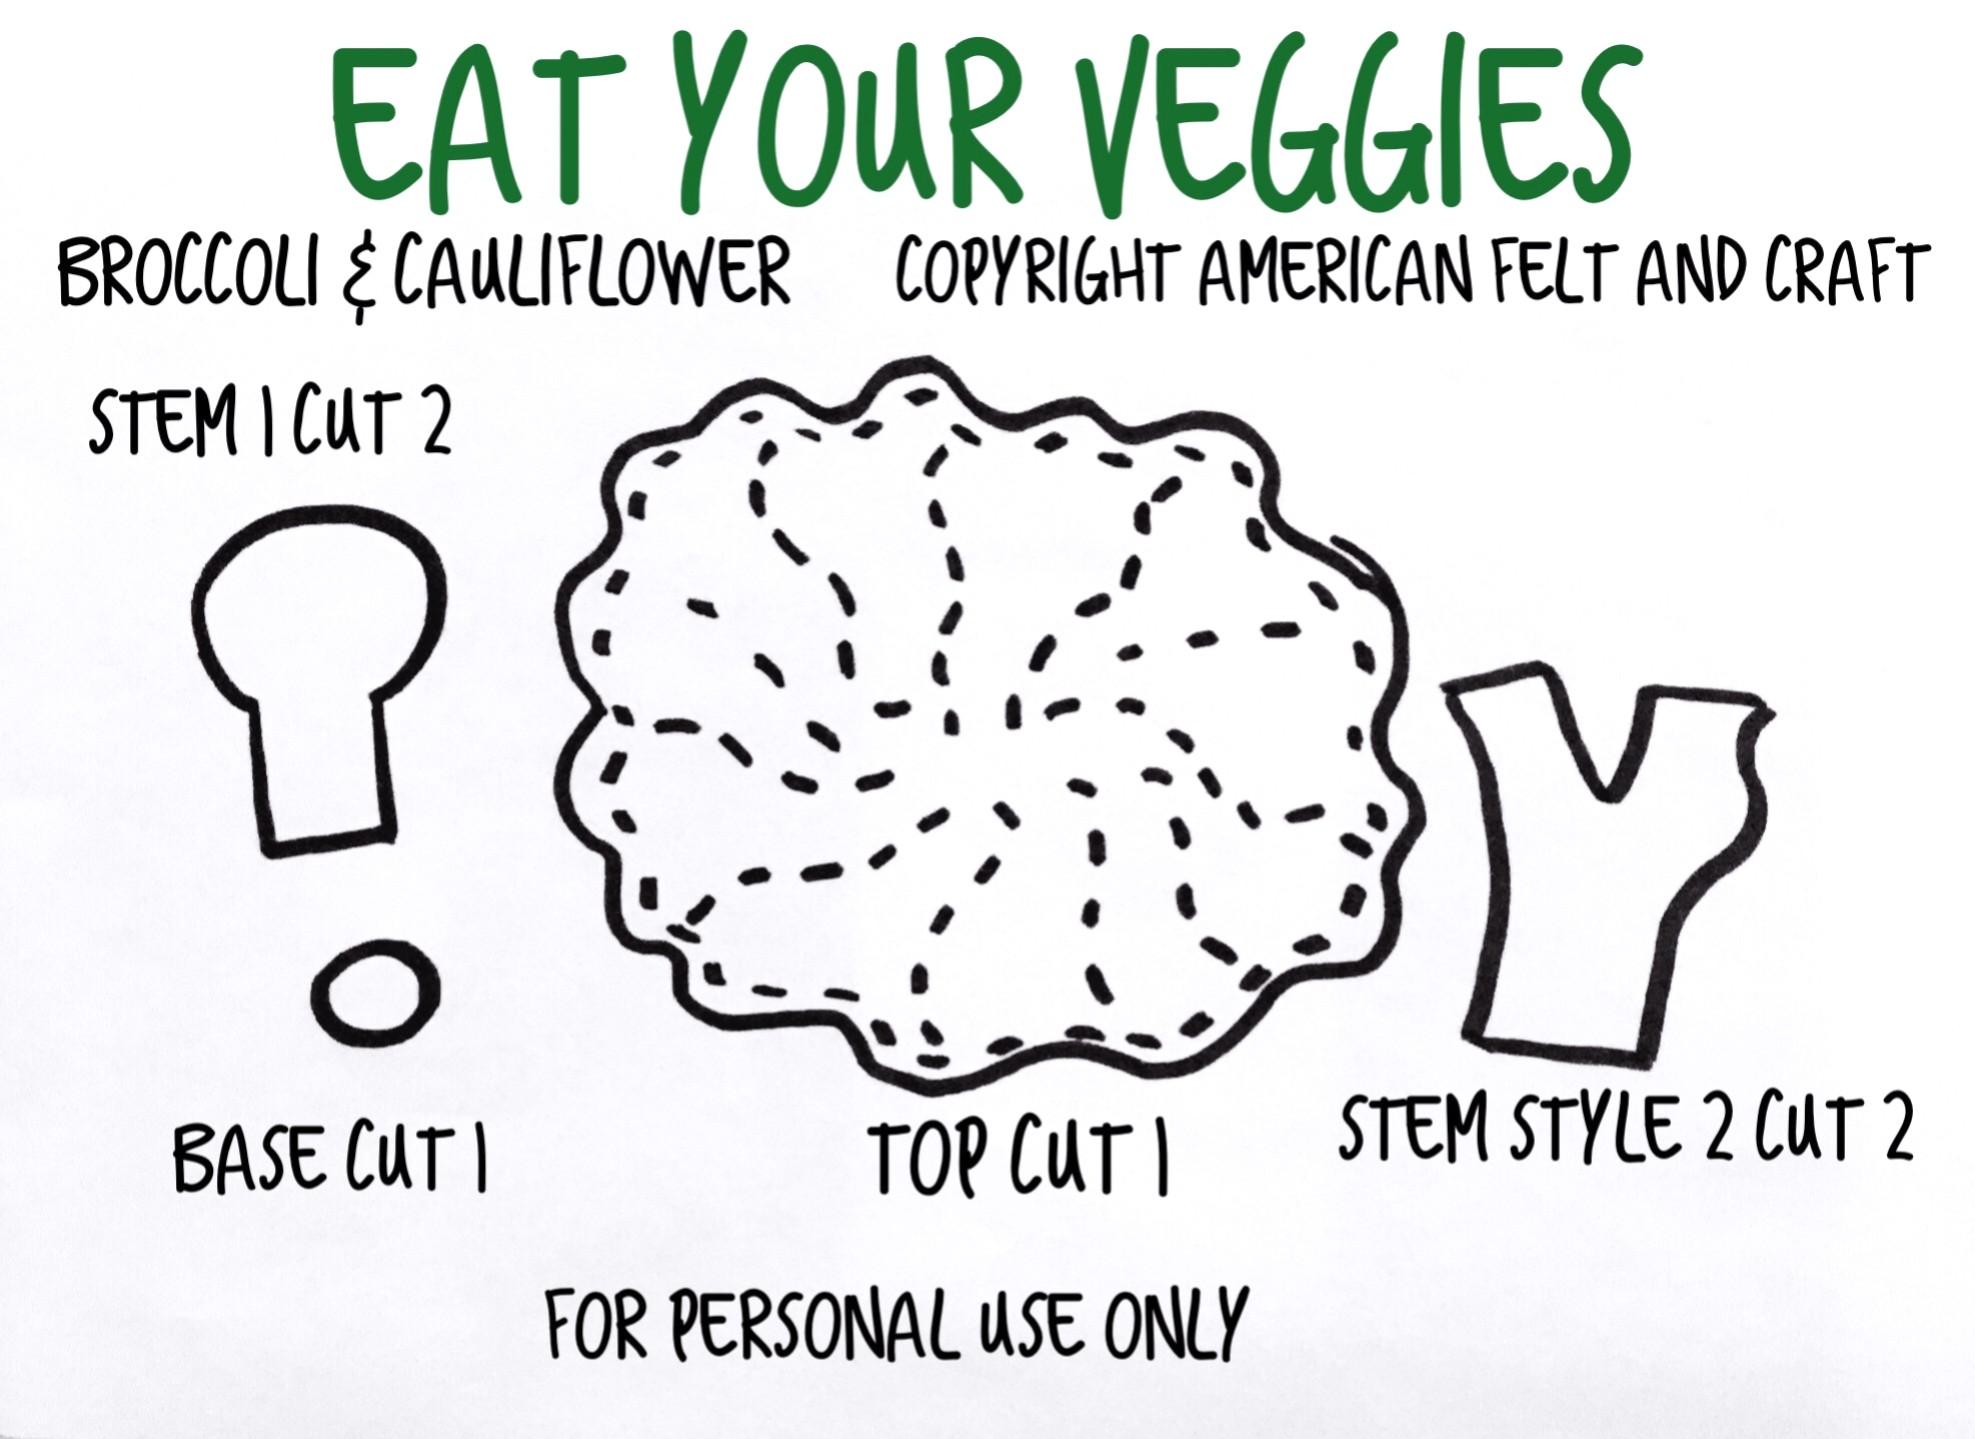 Free Felt Food Pattern - Broccoli and Cauliflower - American Felt and Craft